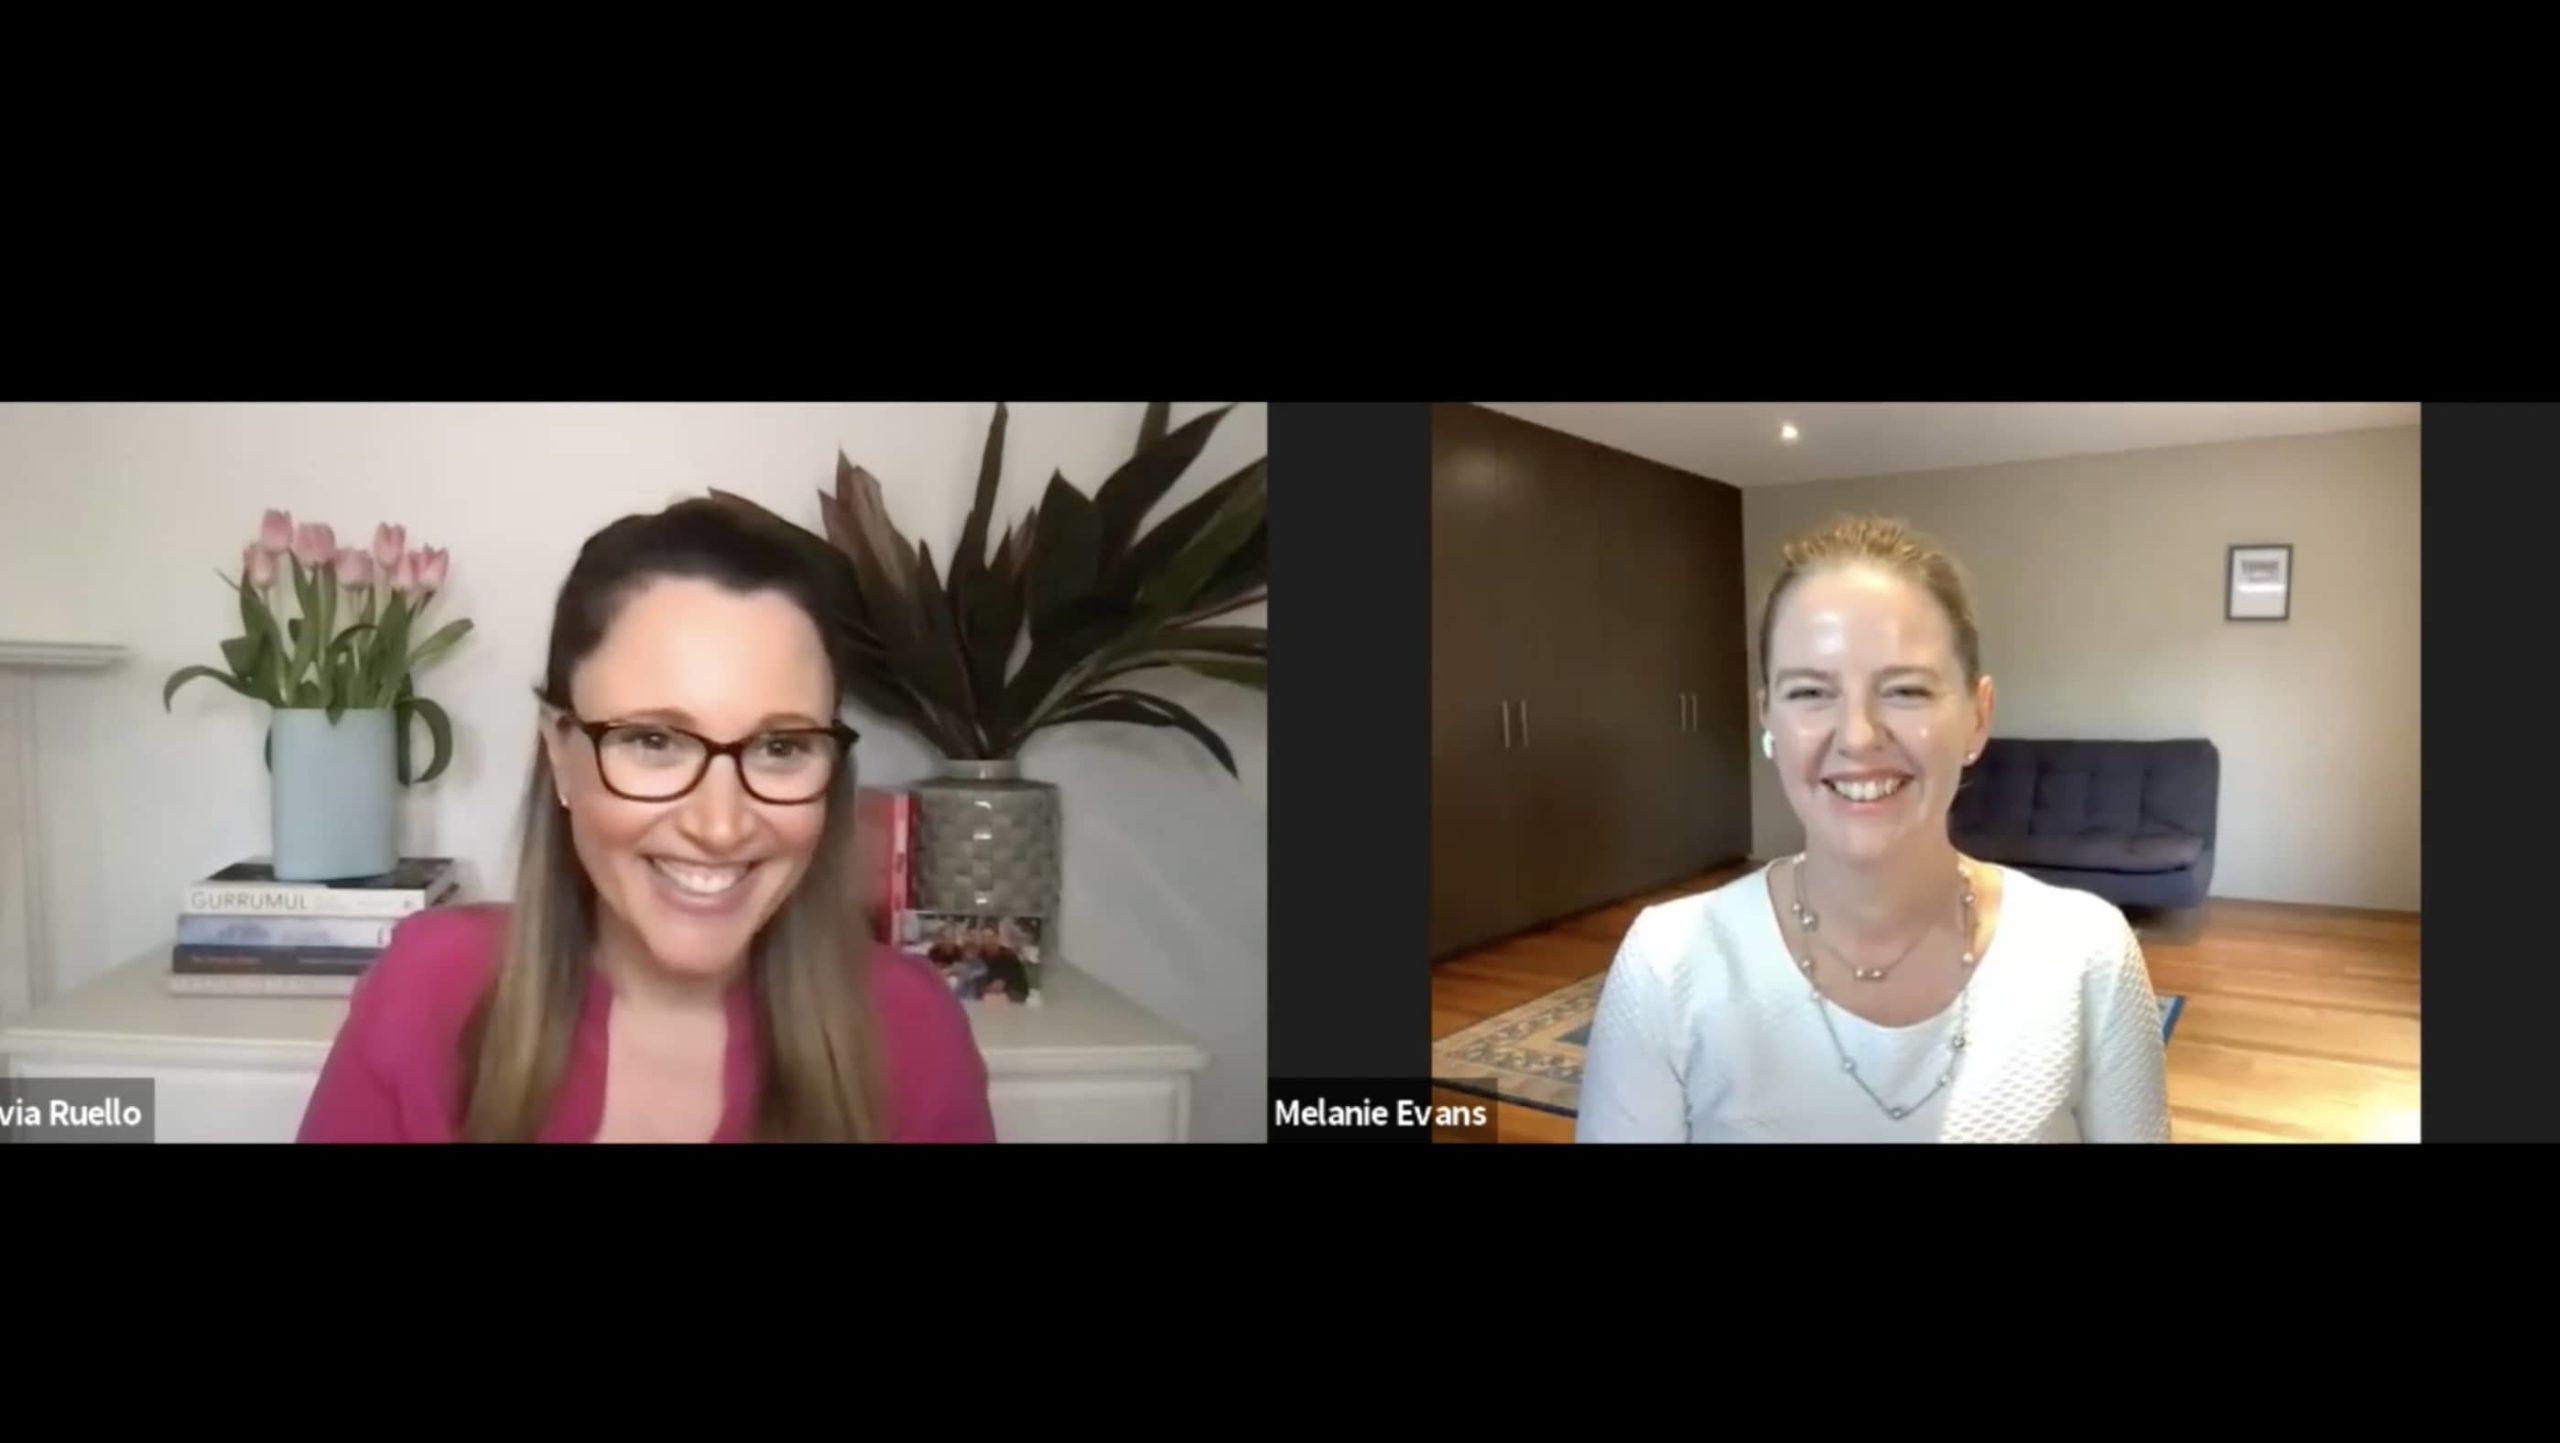 ING Australia CEO Melanie Evans on leadership, wellbeing and moving forward